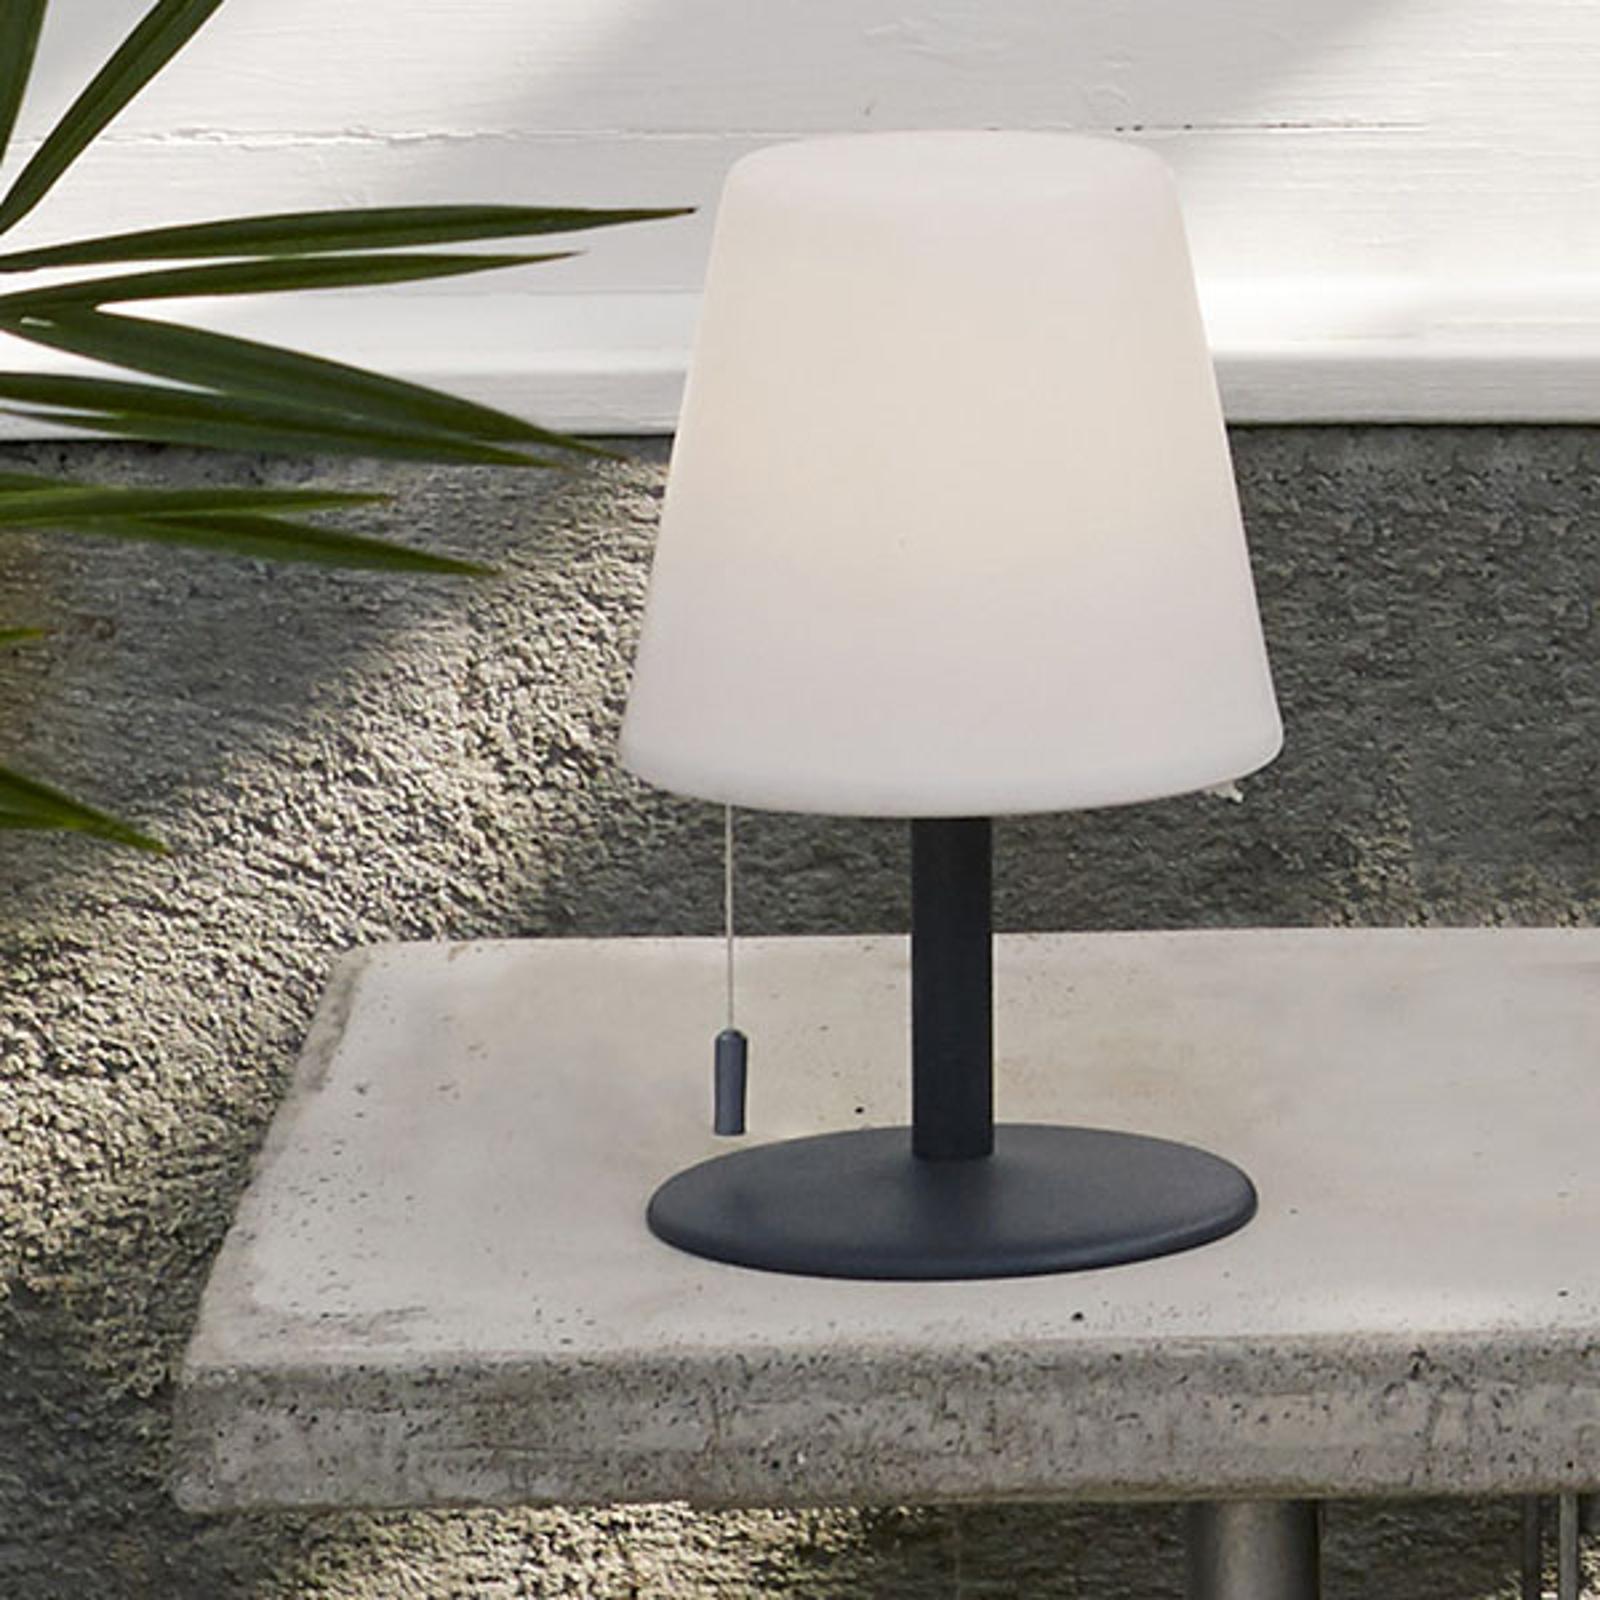 LED-Tischleuchte Gardenlight Kreta mit Akku 26,5cm